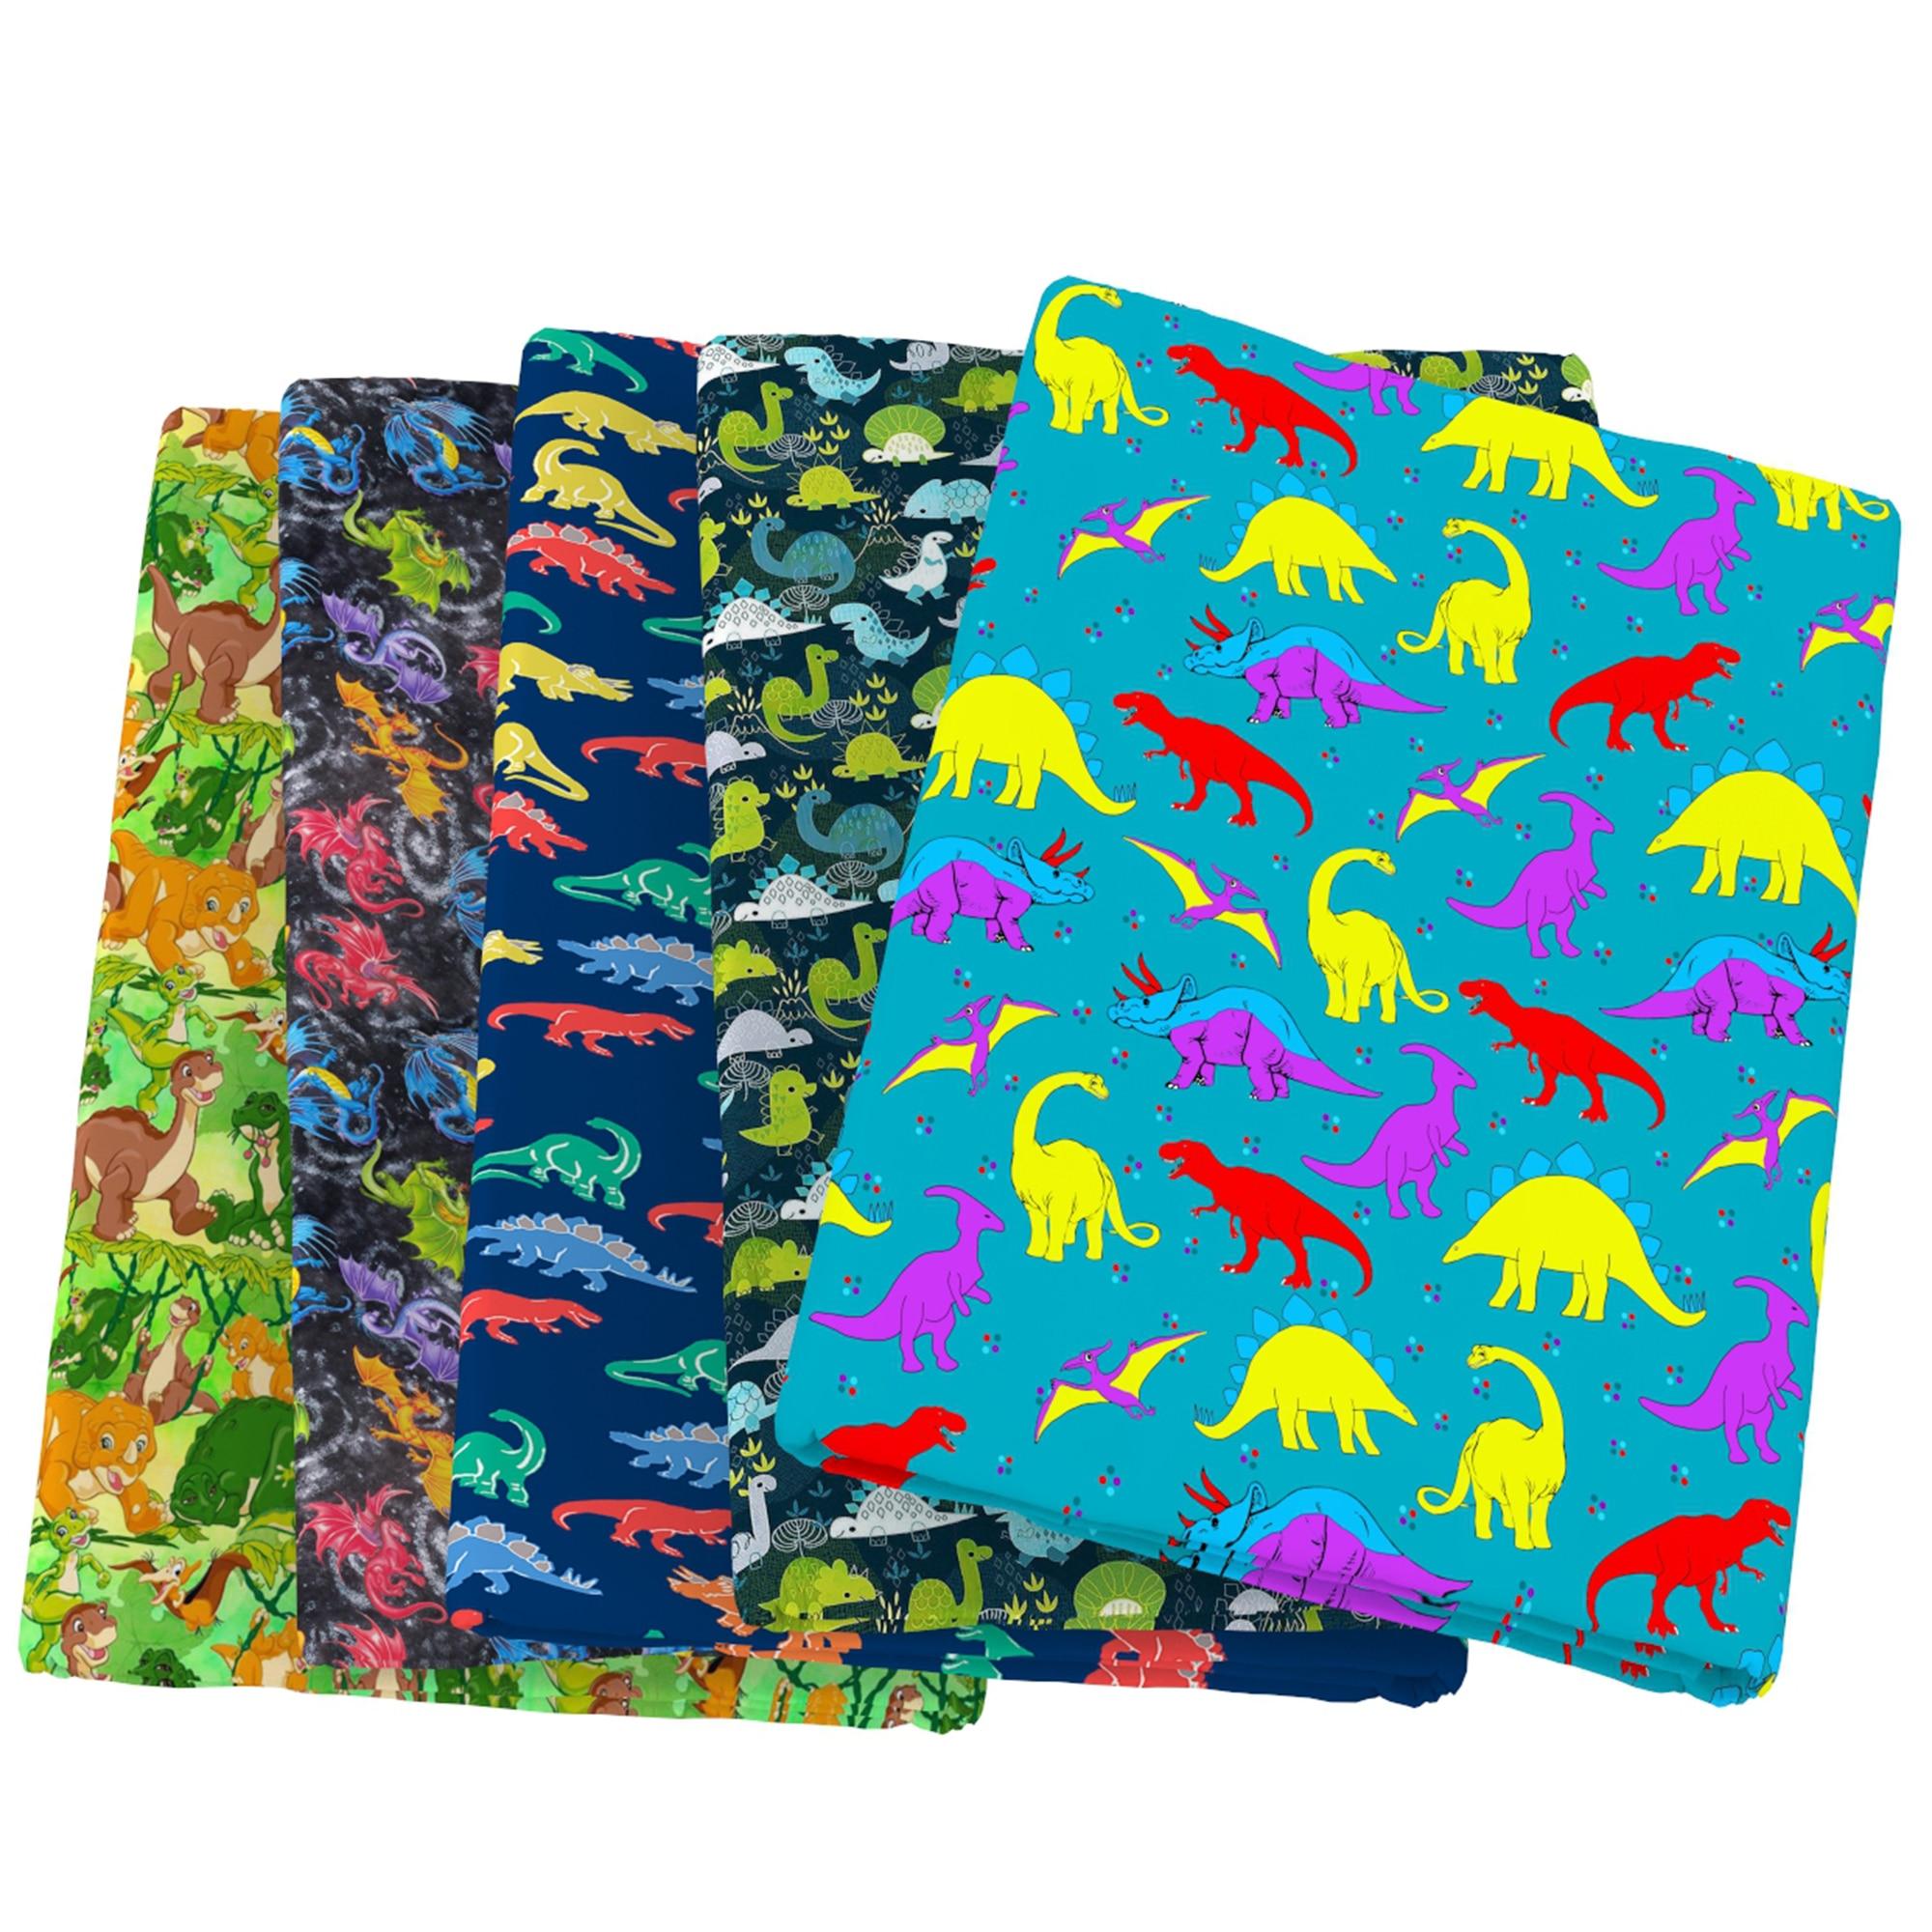 Patchwork Dinosaur Animal Polyester Cotton Fabric Sewing Quilting Fabrics Needlework Material DIY Handmade Cloth,c14071